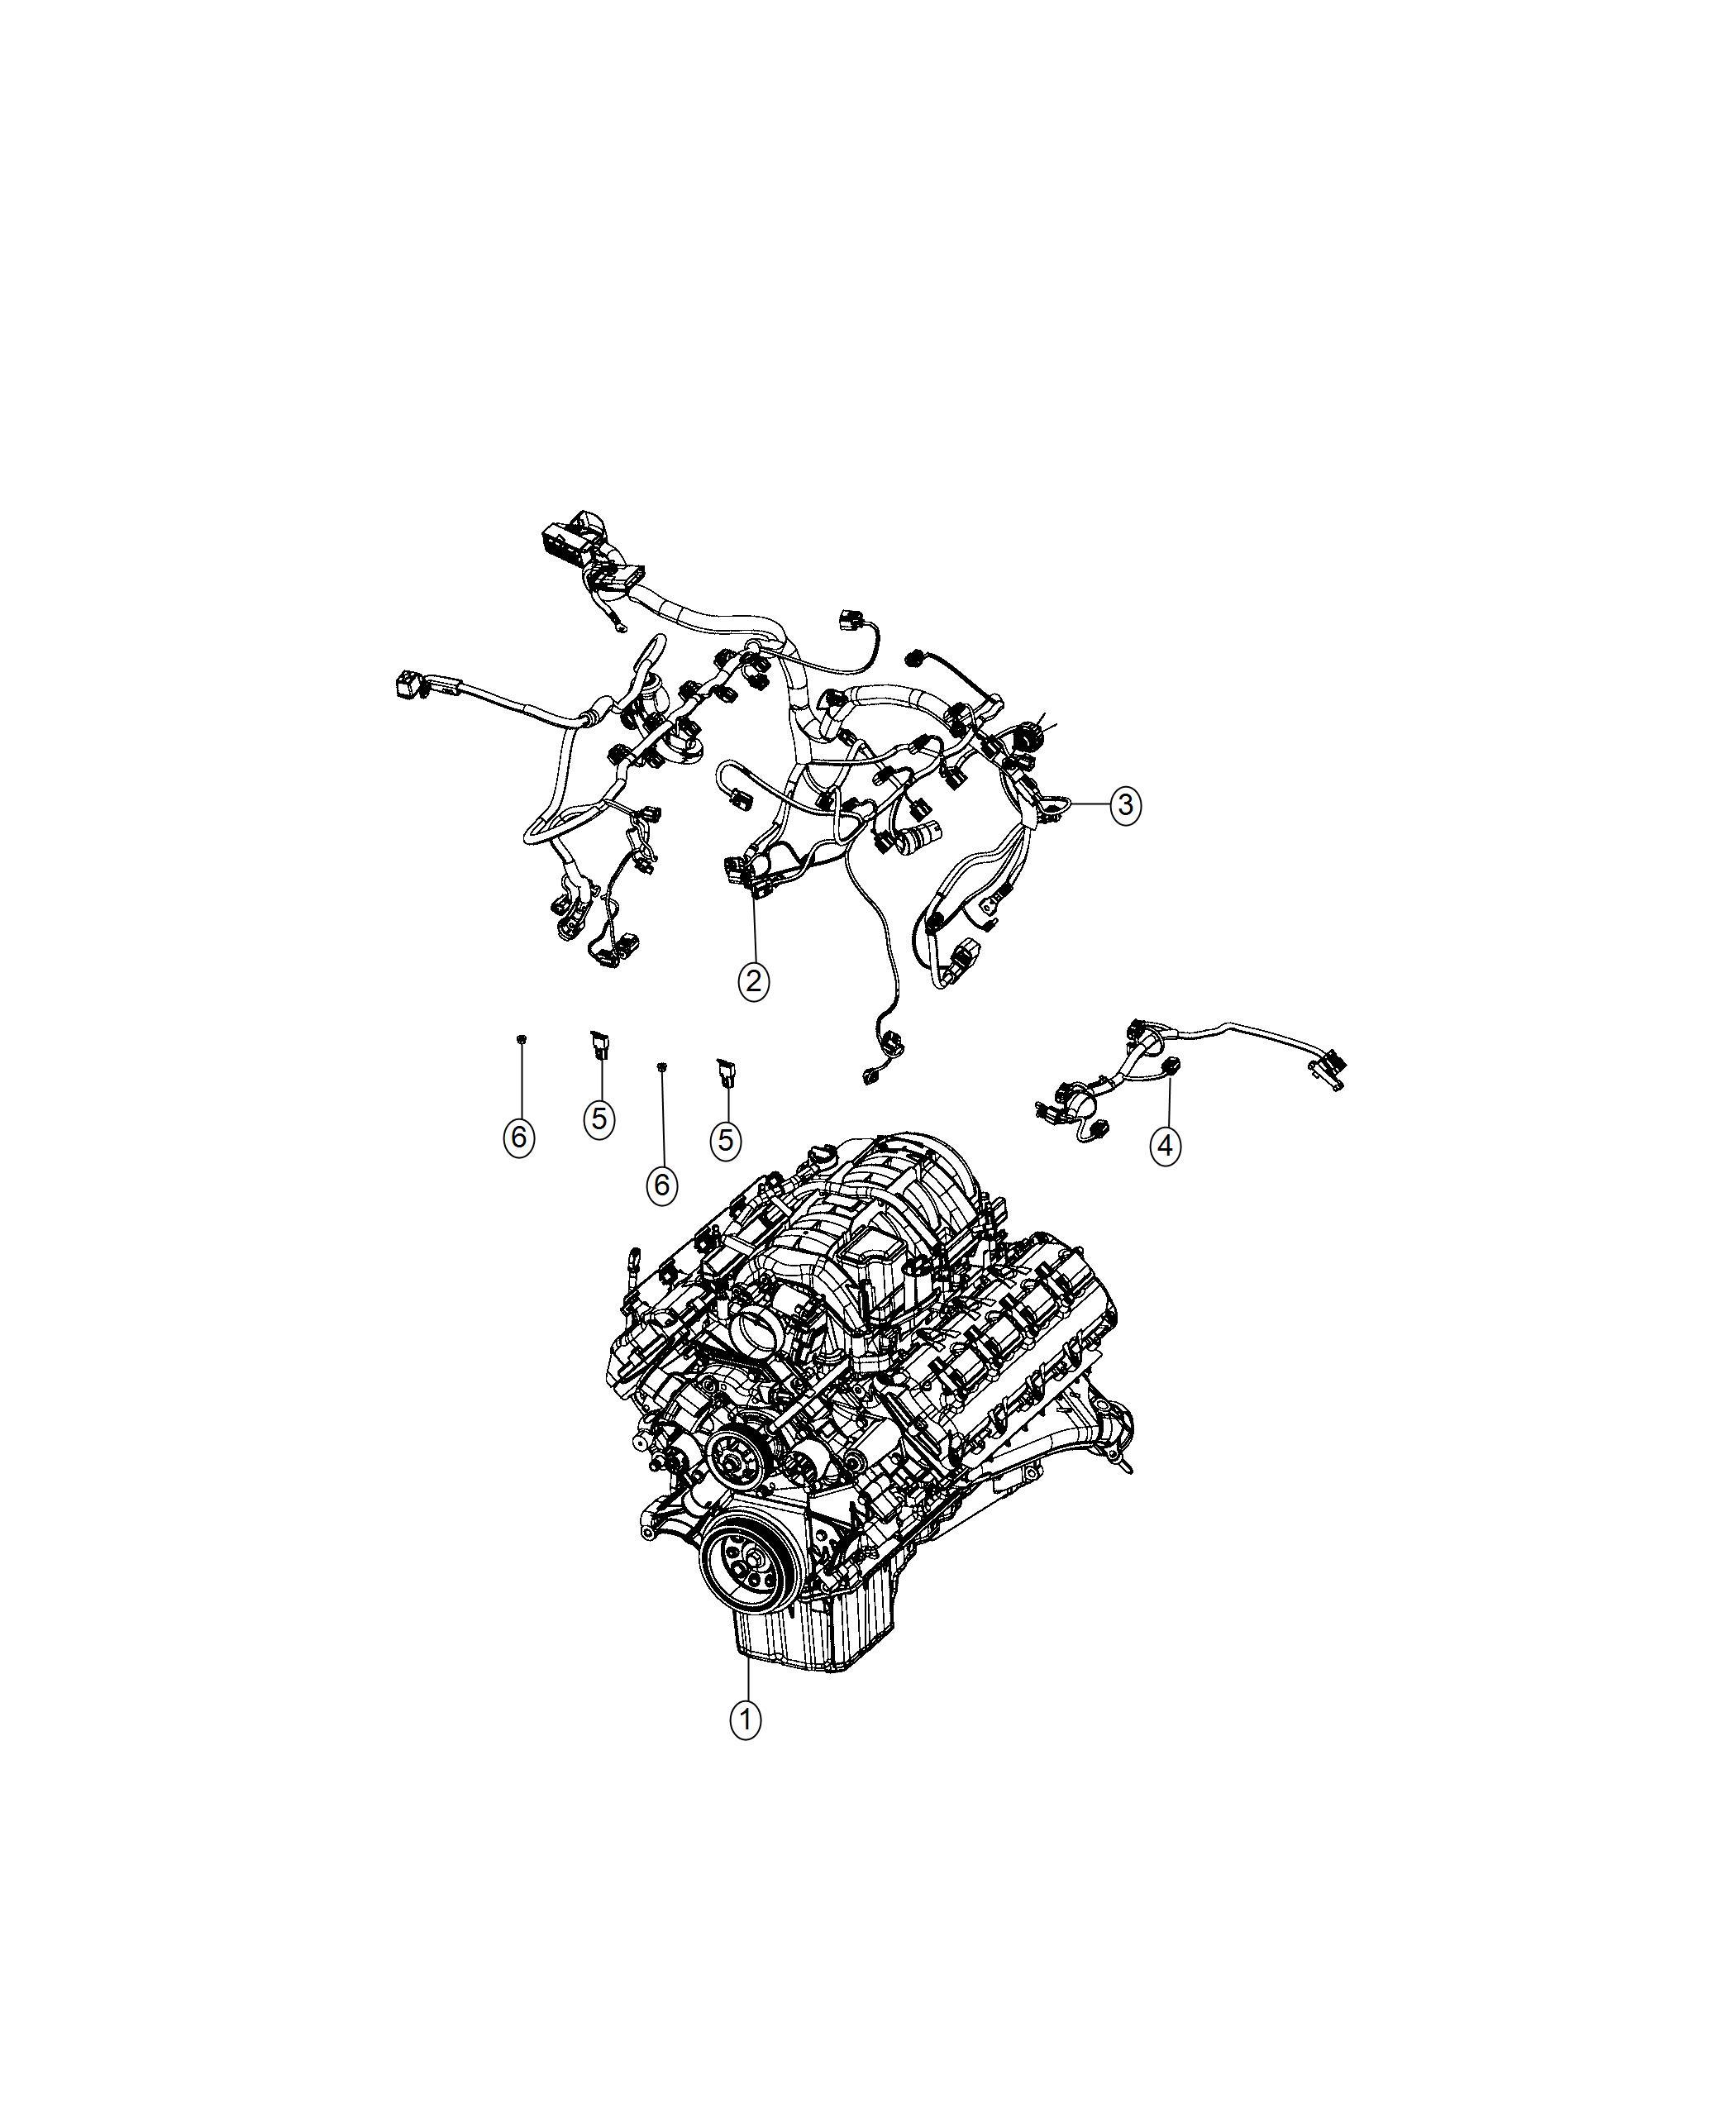 Dodge Challenger Wiring Engine Oil Fca Cooler